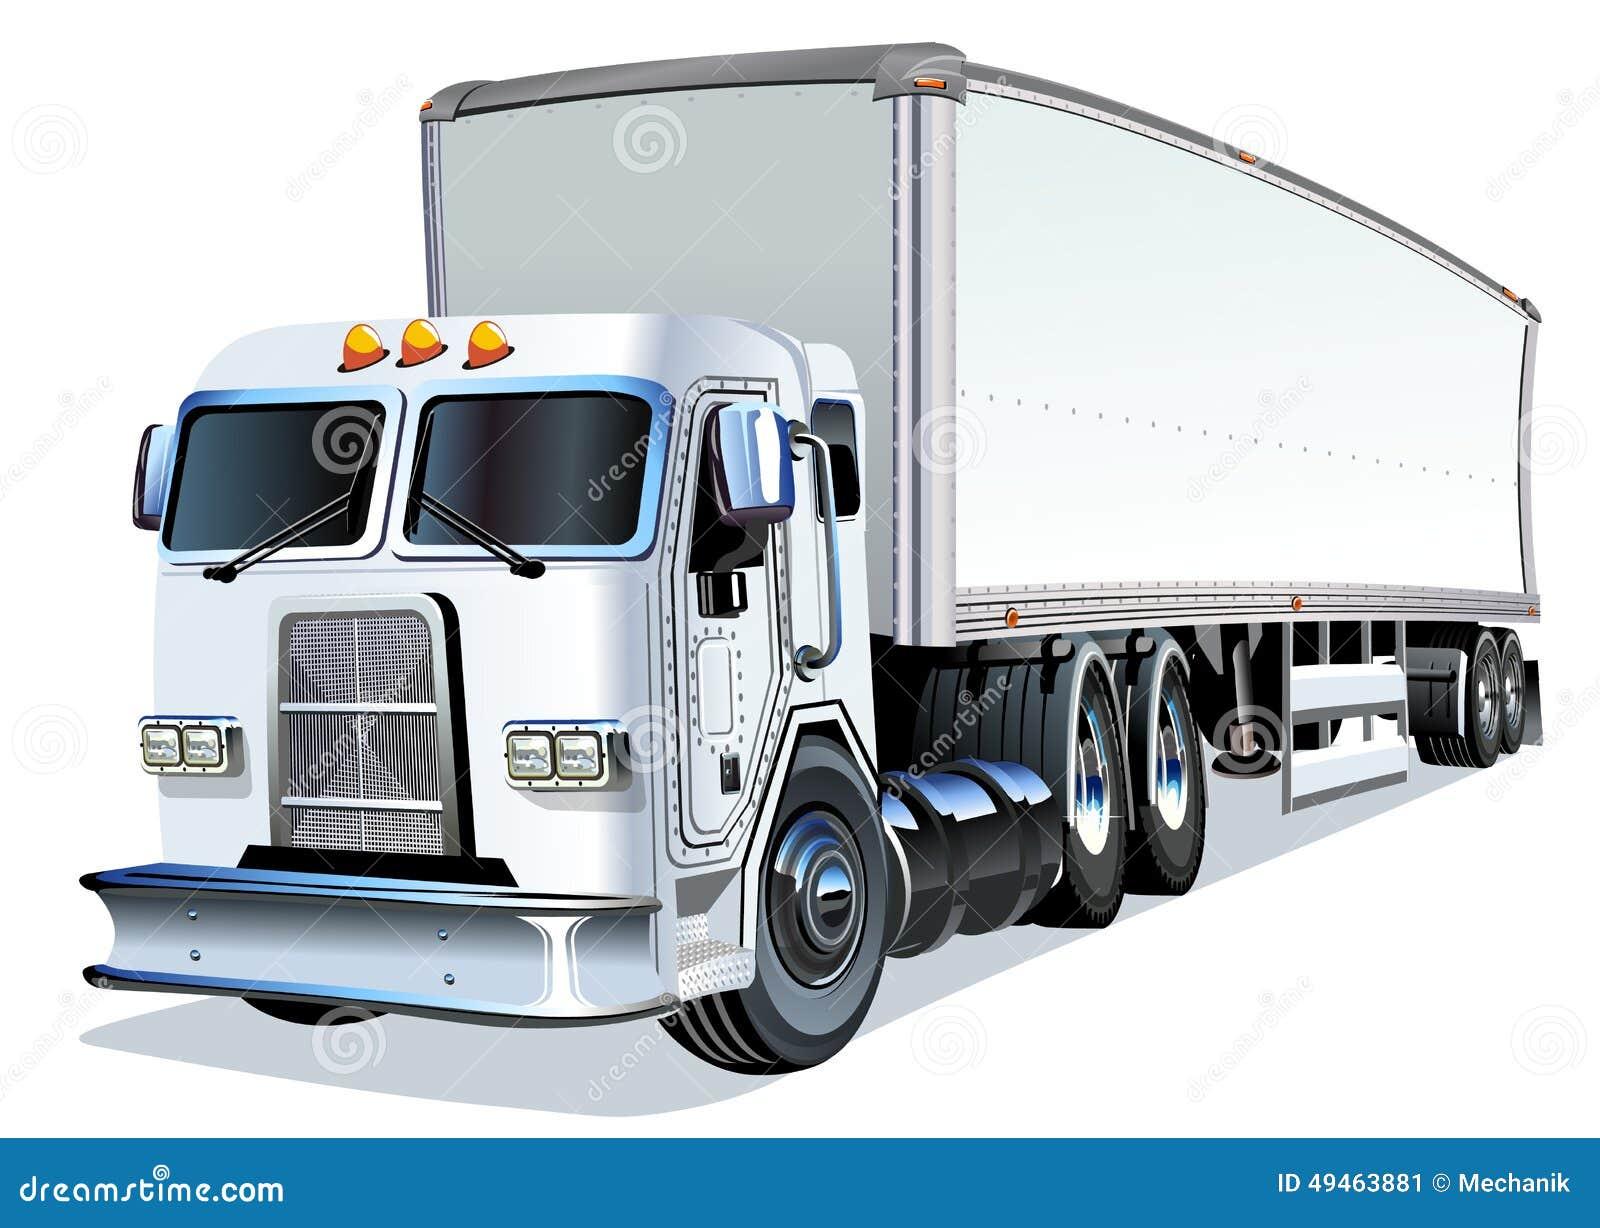 Semi Truck Seats >> Cartoon Semi Truck stock vector. Image of delivery, loading - 49463881